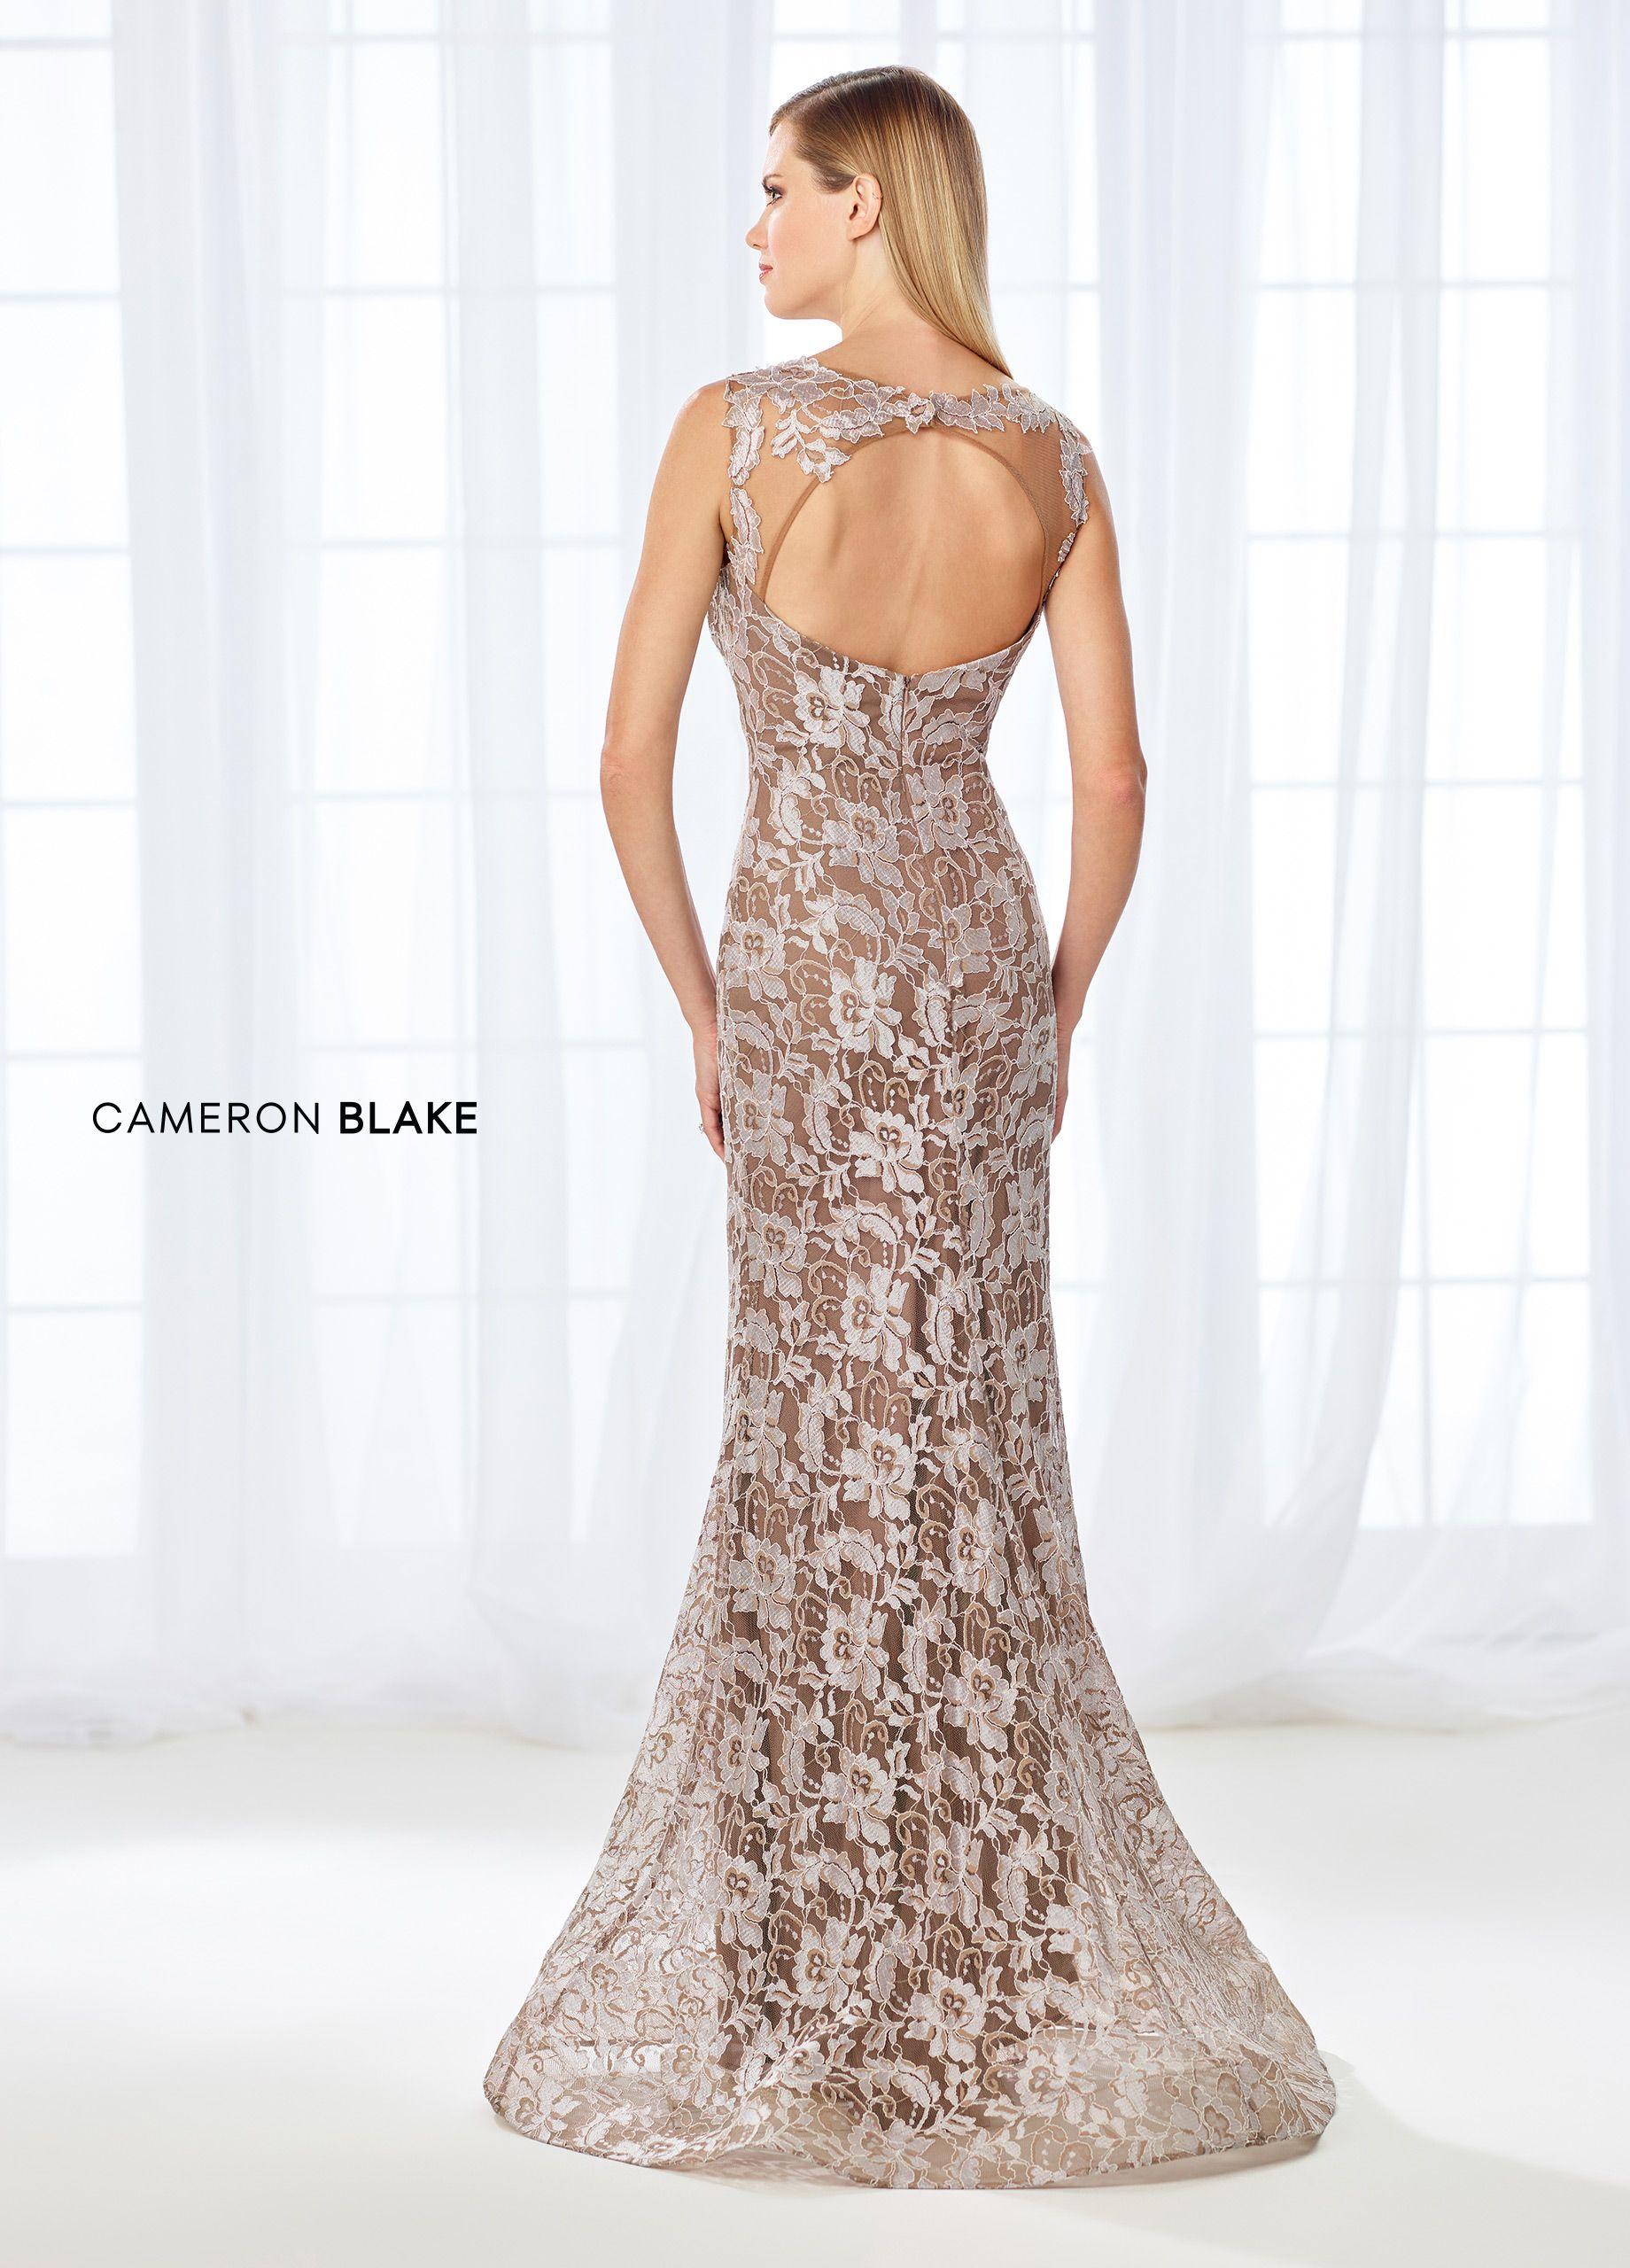 Cameron Blake - Evening Dresses - 118671 | Abiyeler | Pinterest ...